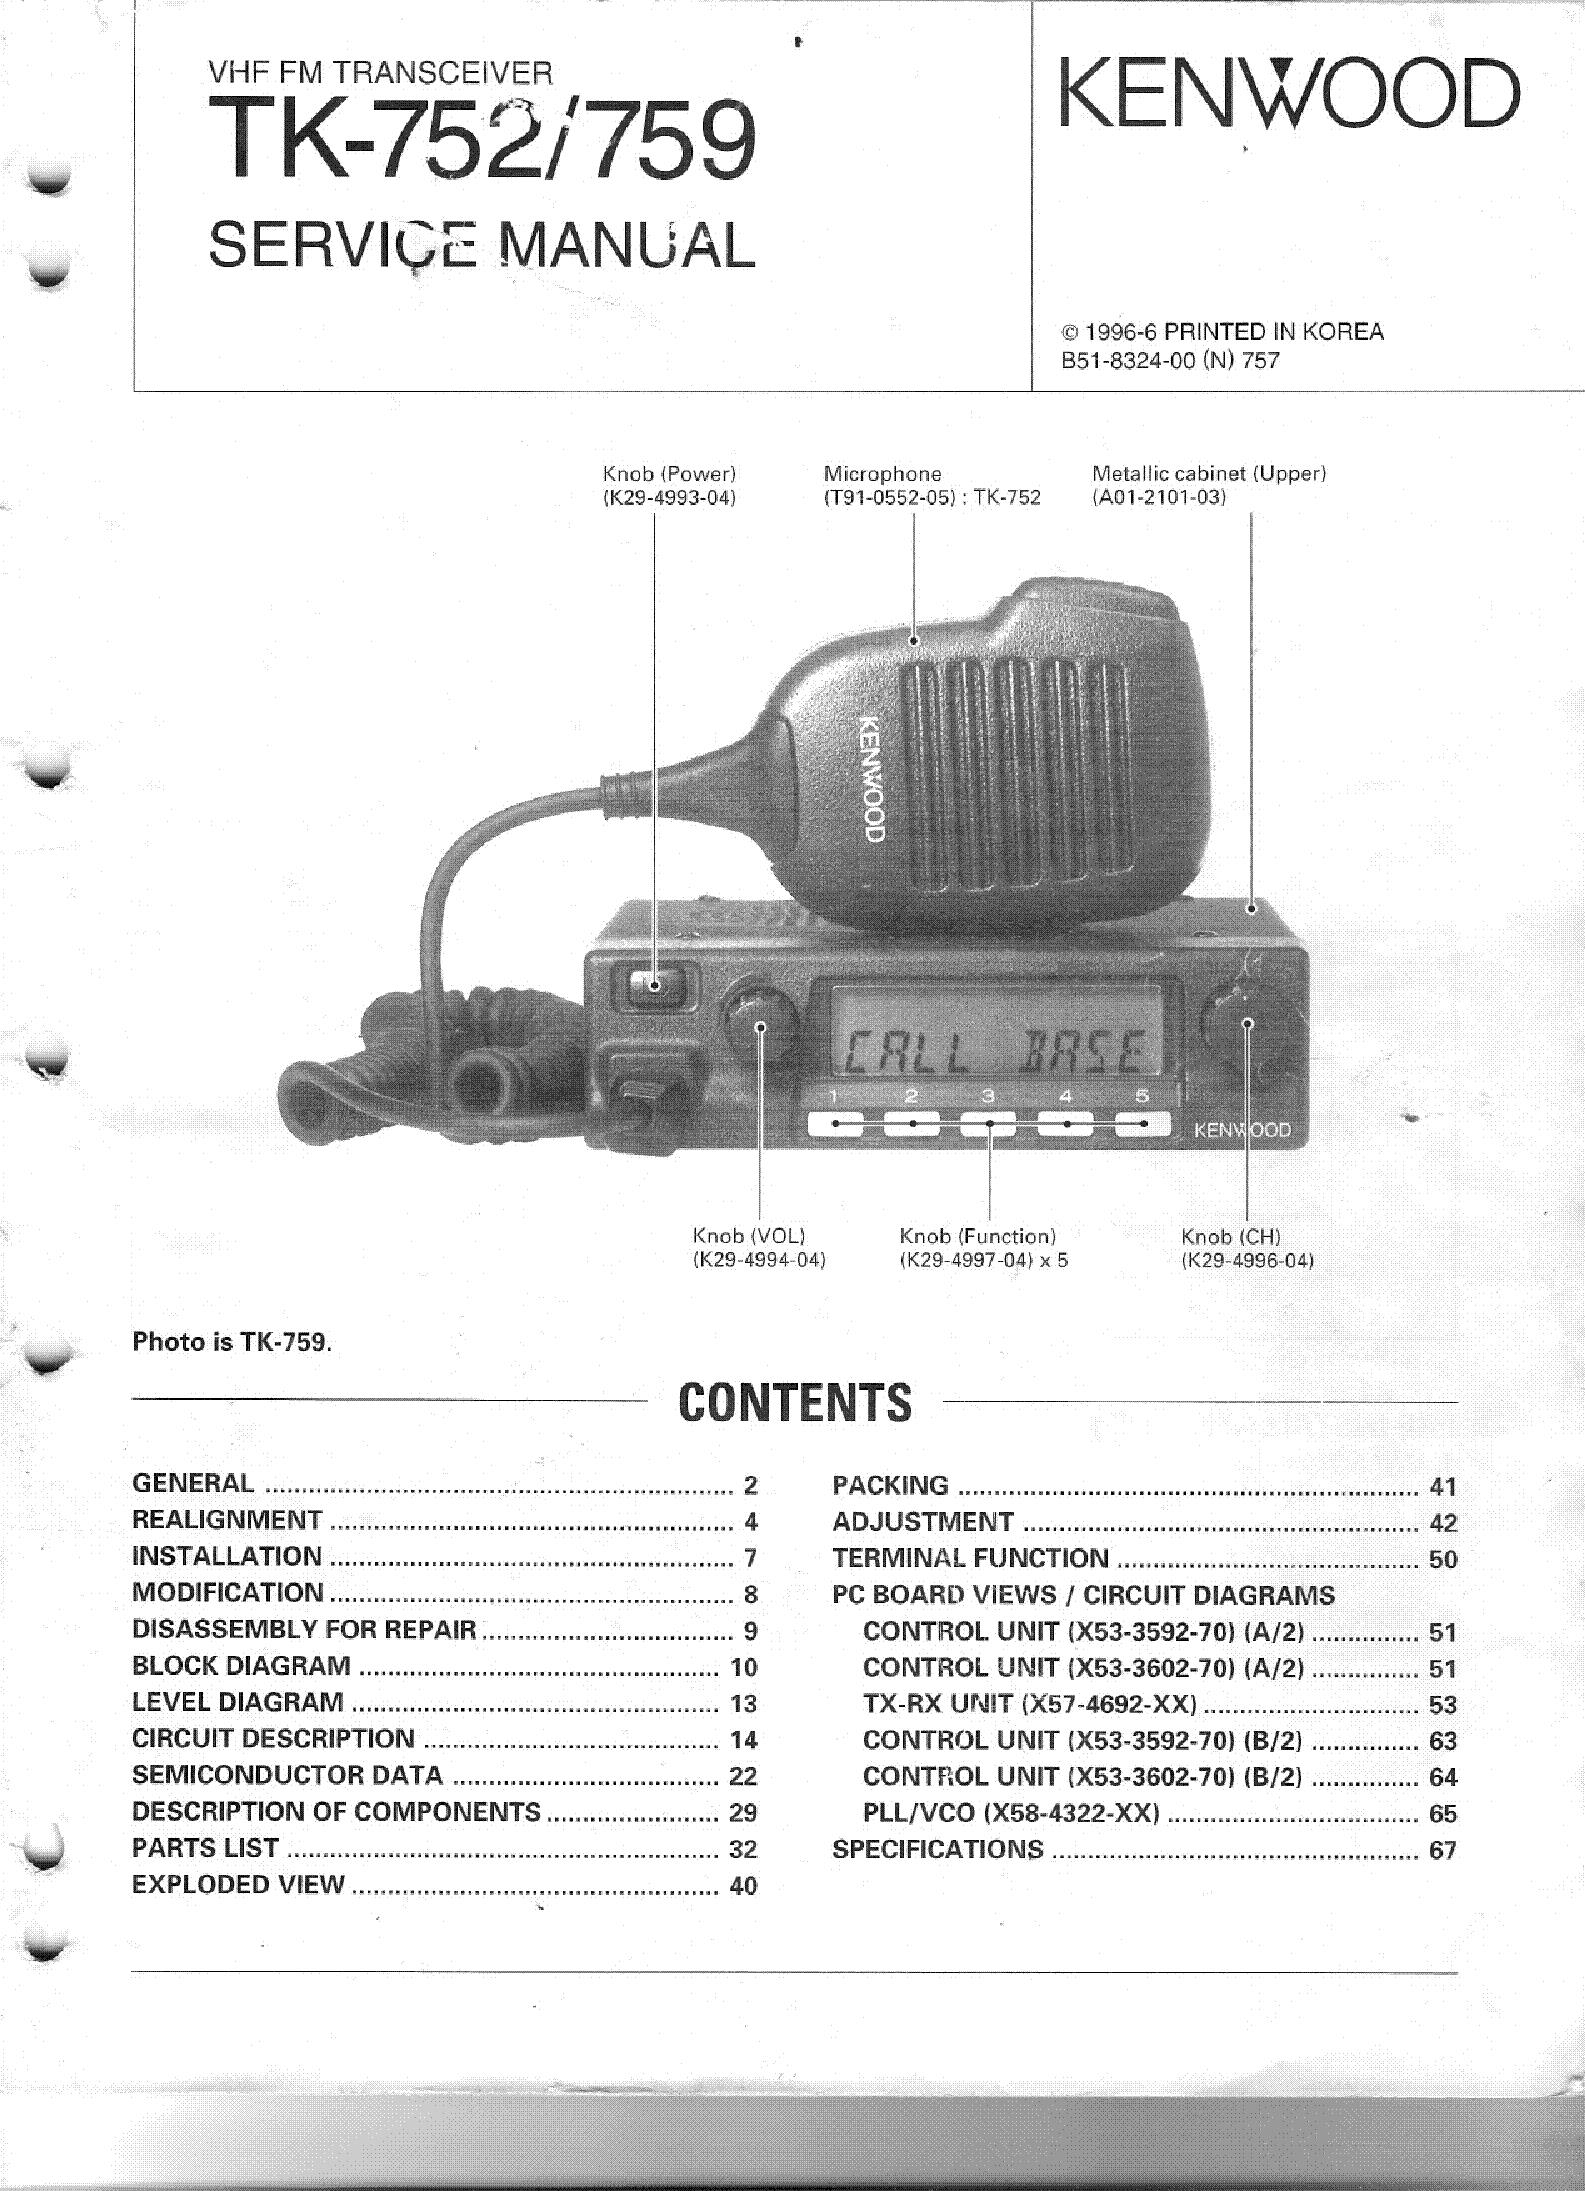 KENWOOD TK-752 TK-759 service manual (1st page)